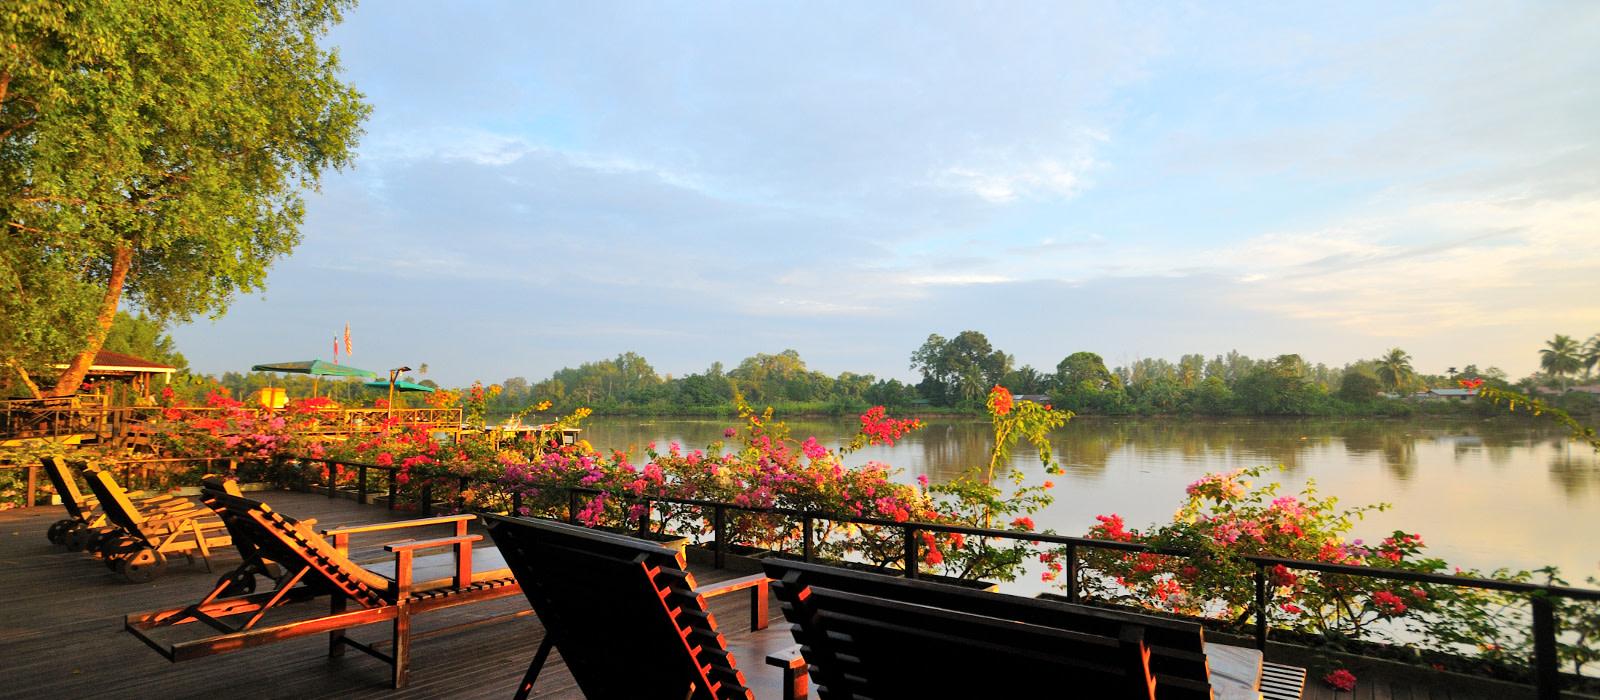 Reiseziel Abai, Kinabatangan River Malaysia